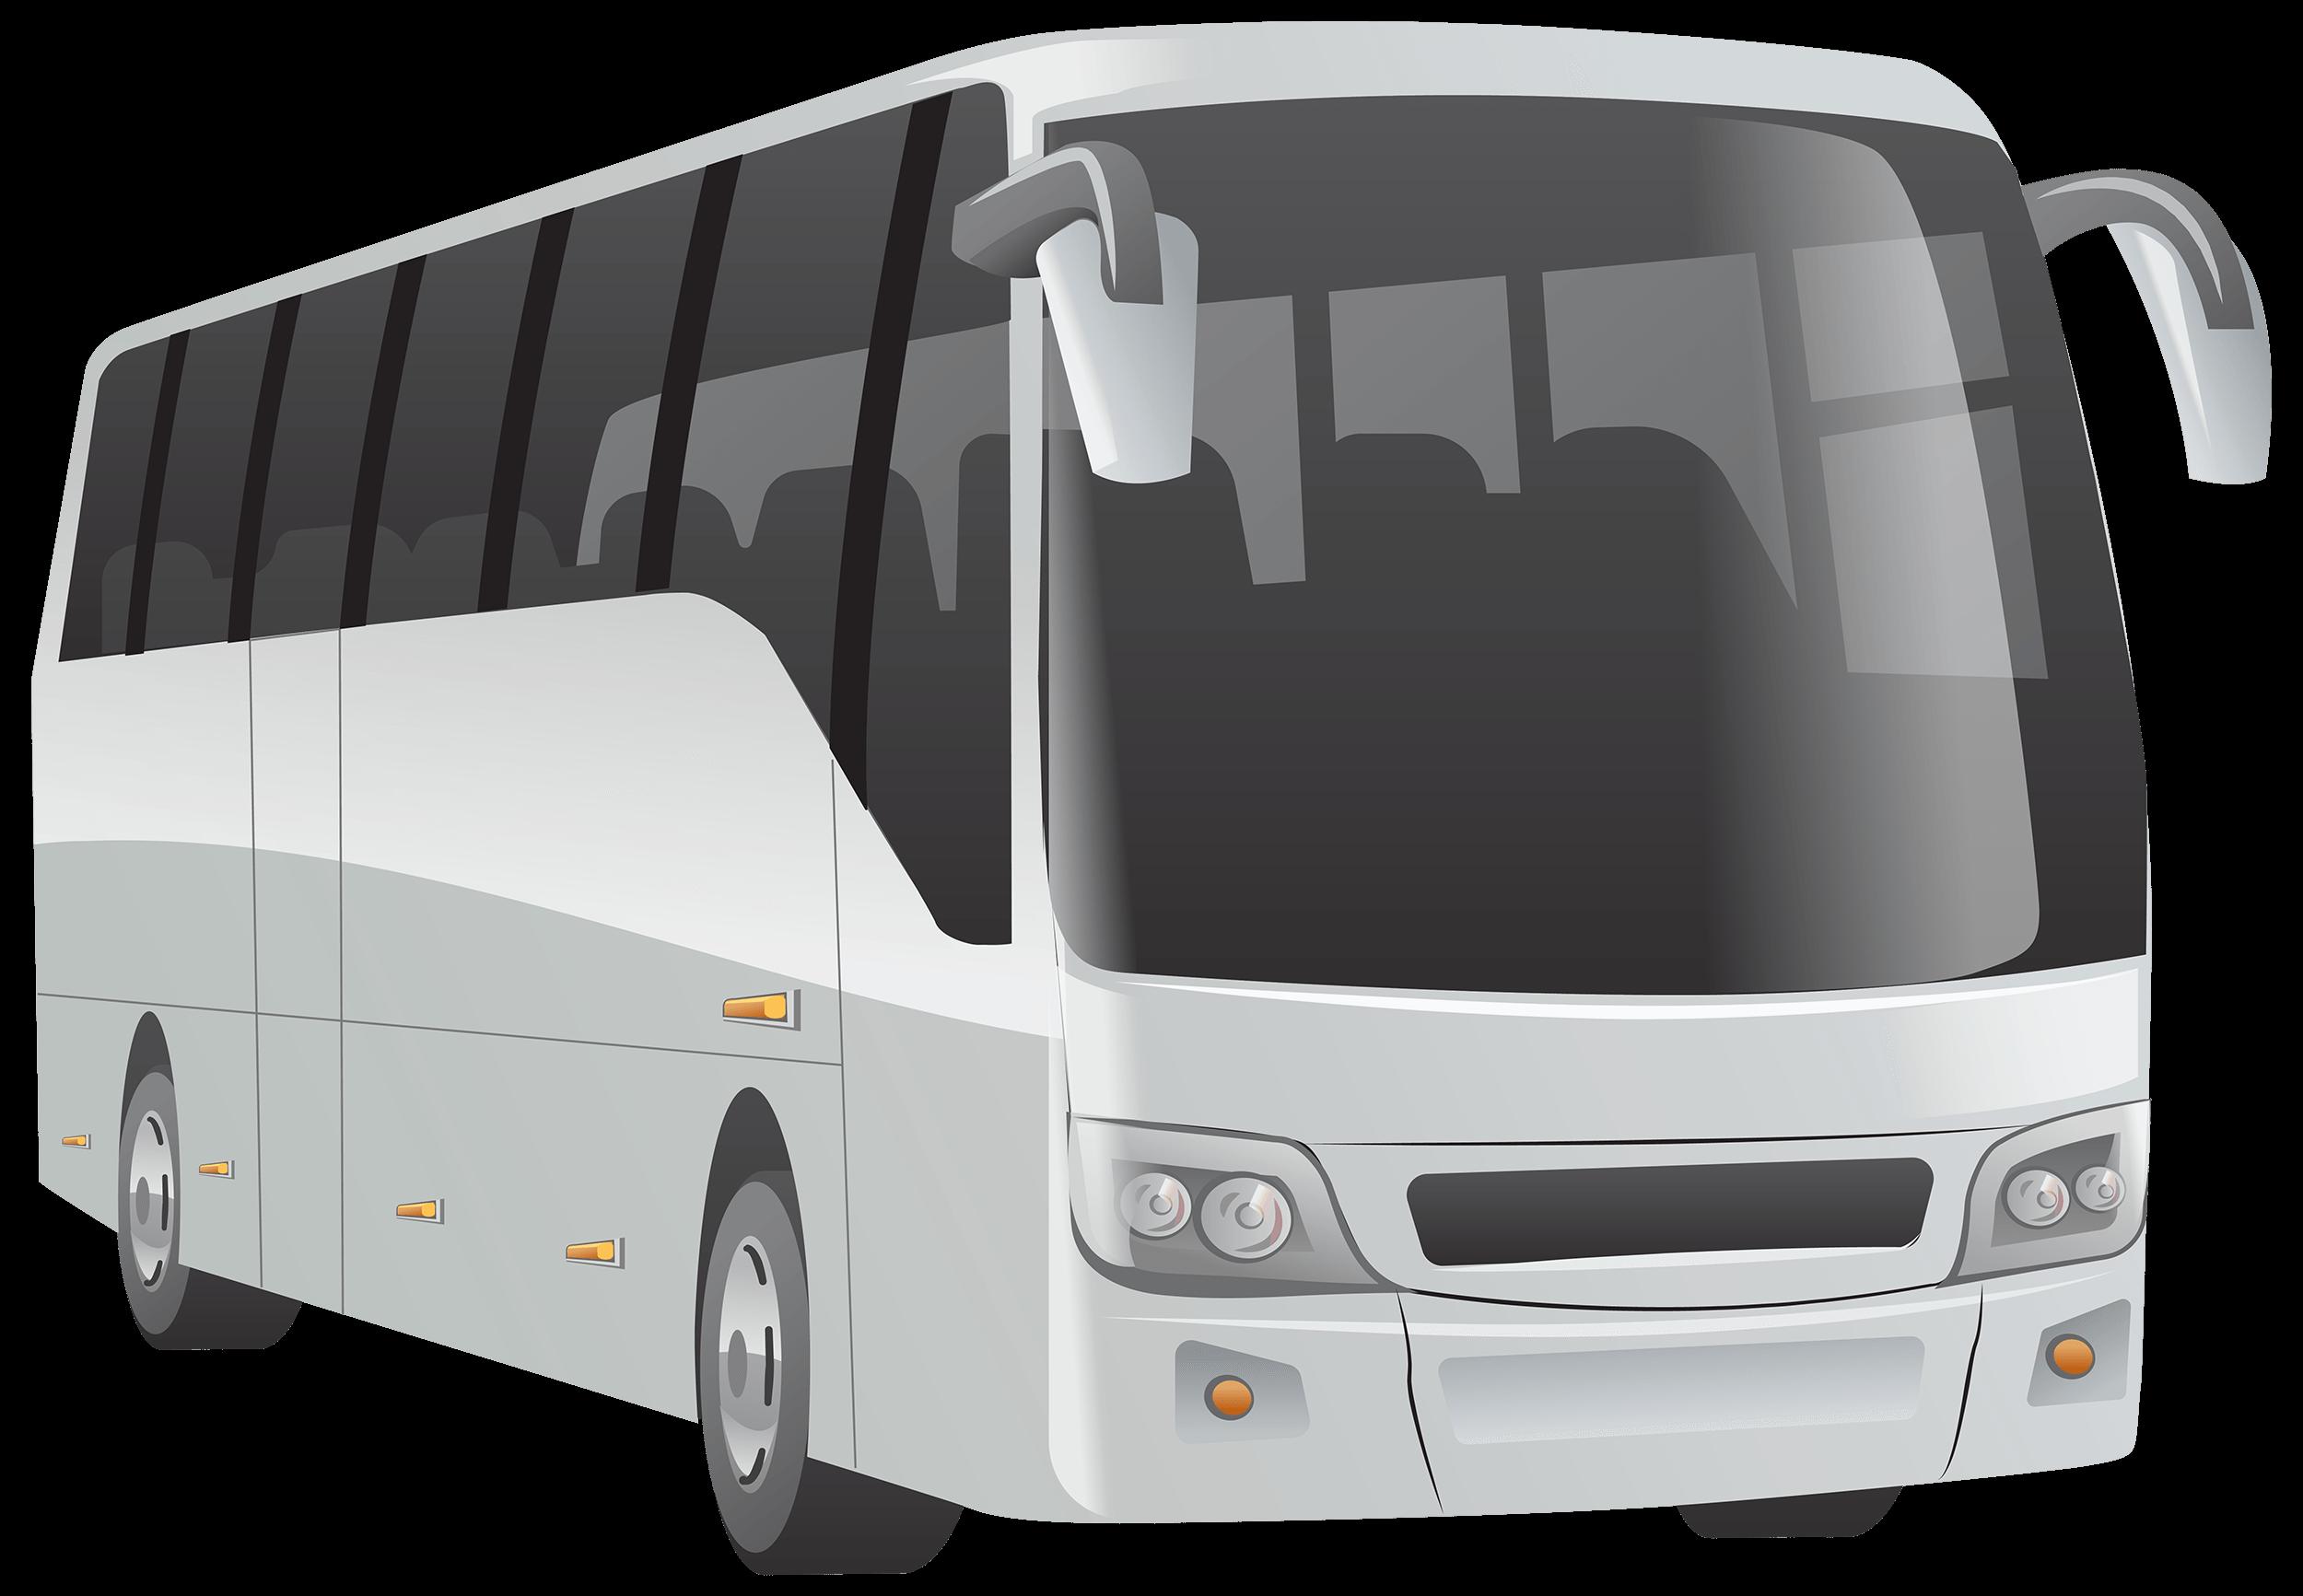 clip free download Buses transparent PNG images